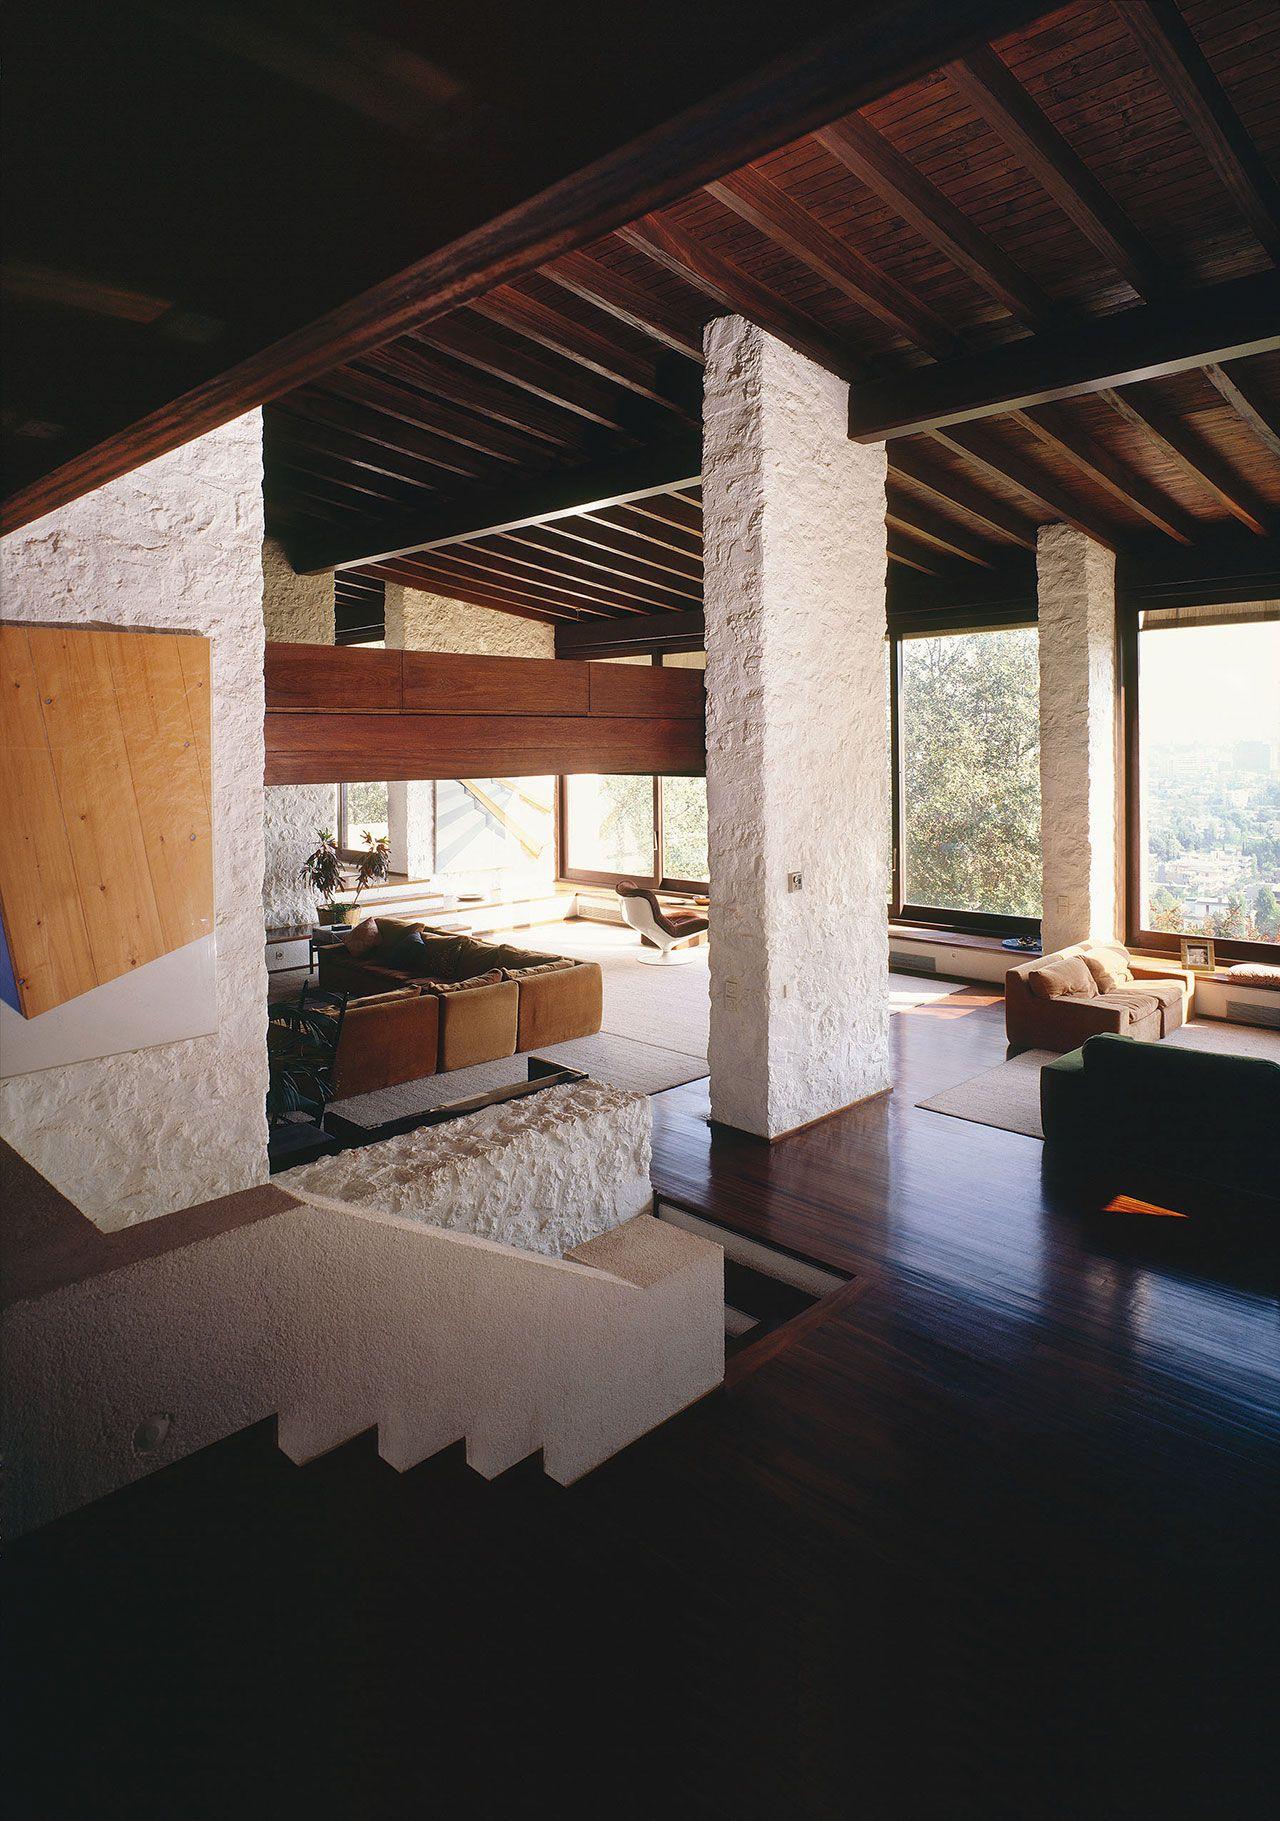 The Inspirational Designs of Greek Architect Nicos Valsamakis ...